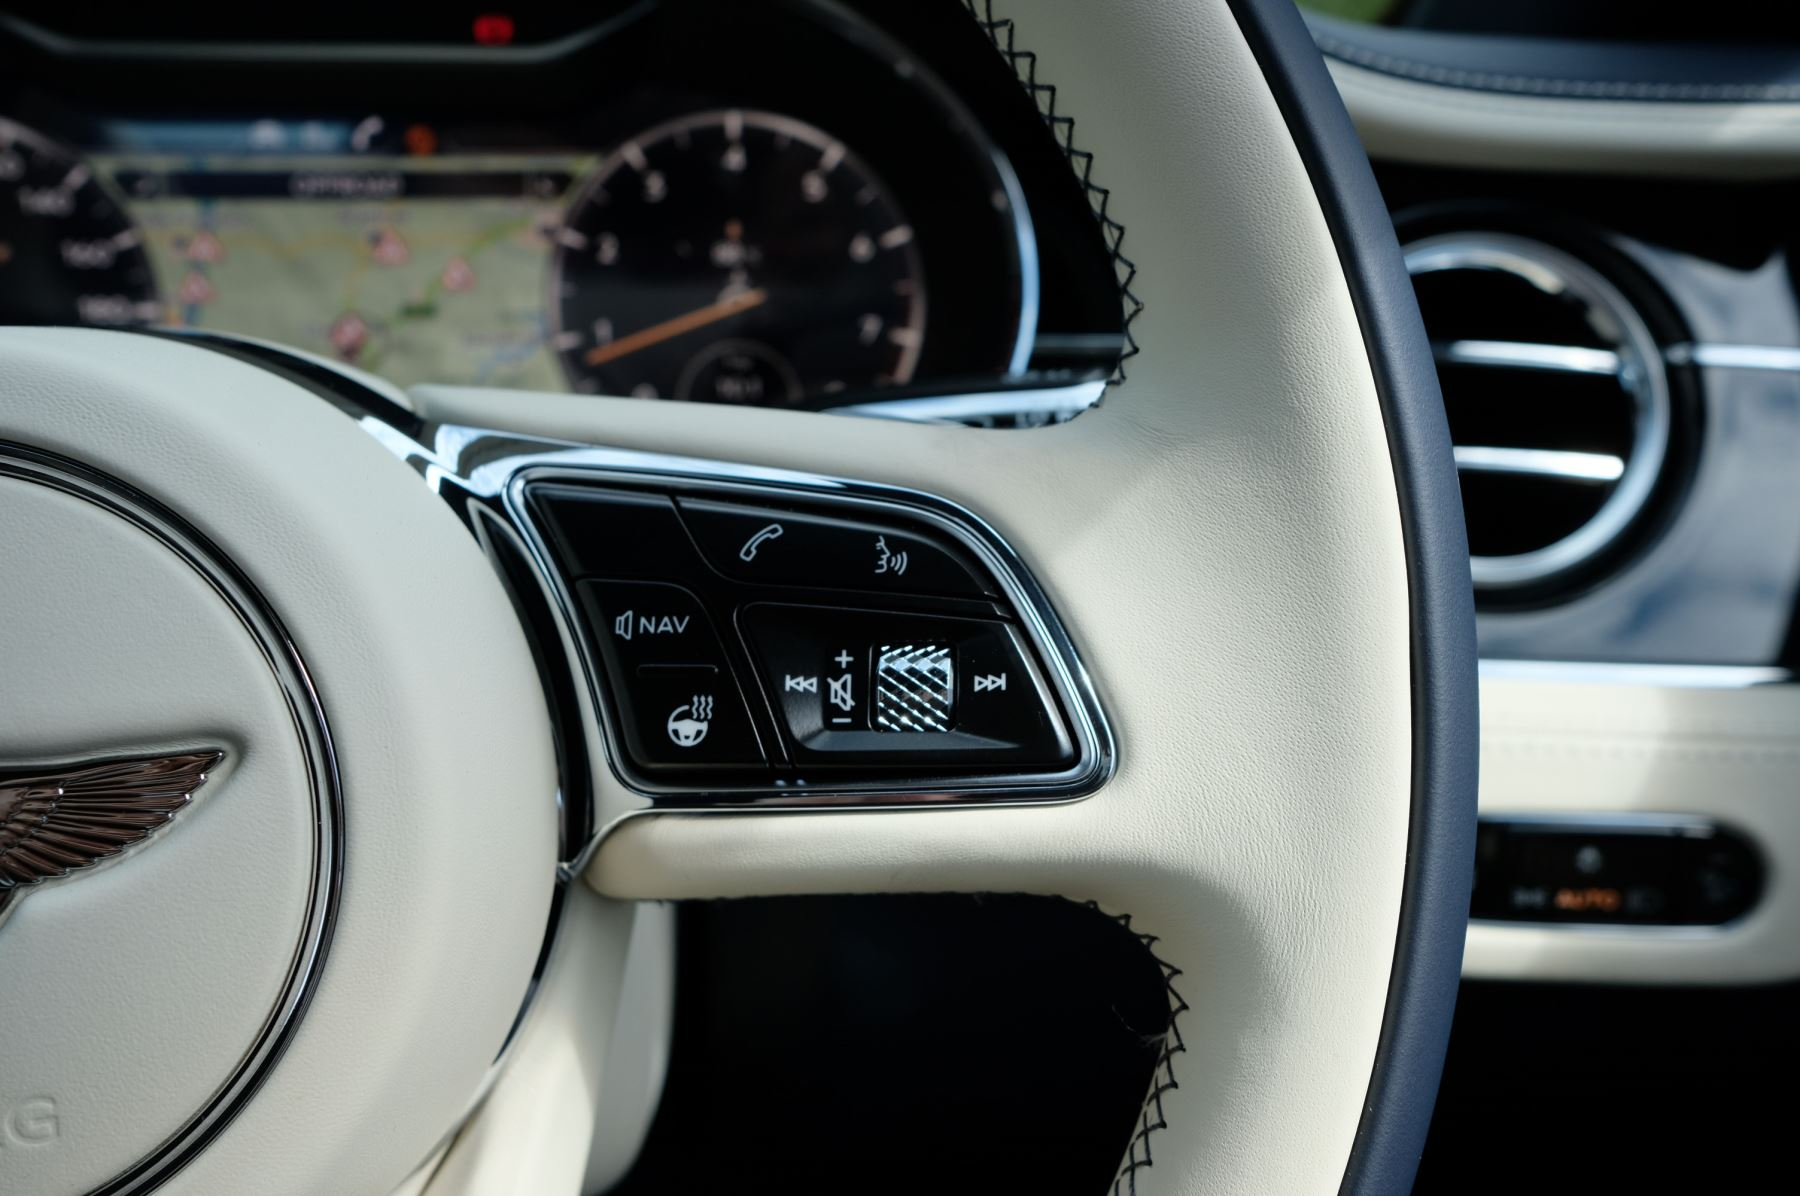 Bentley Continental GTC 4.0 V8 Mulliner Edition 2dr Auto [Tour Spec] image 24